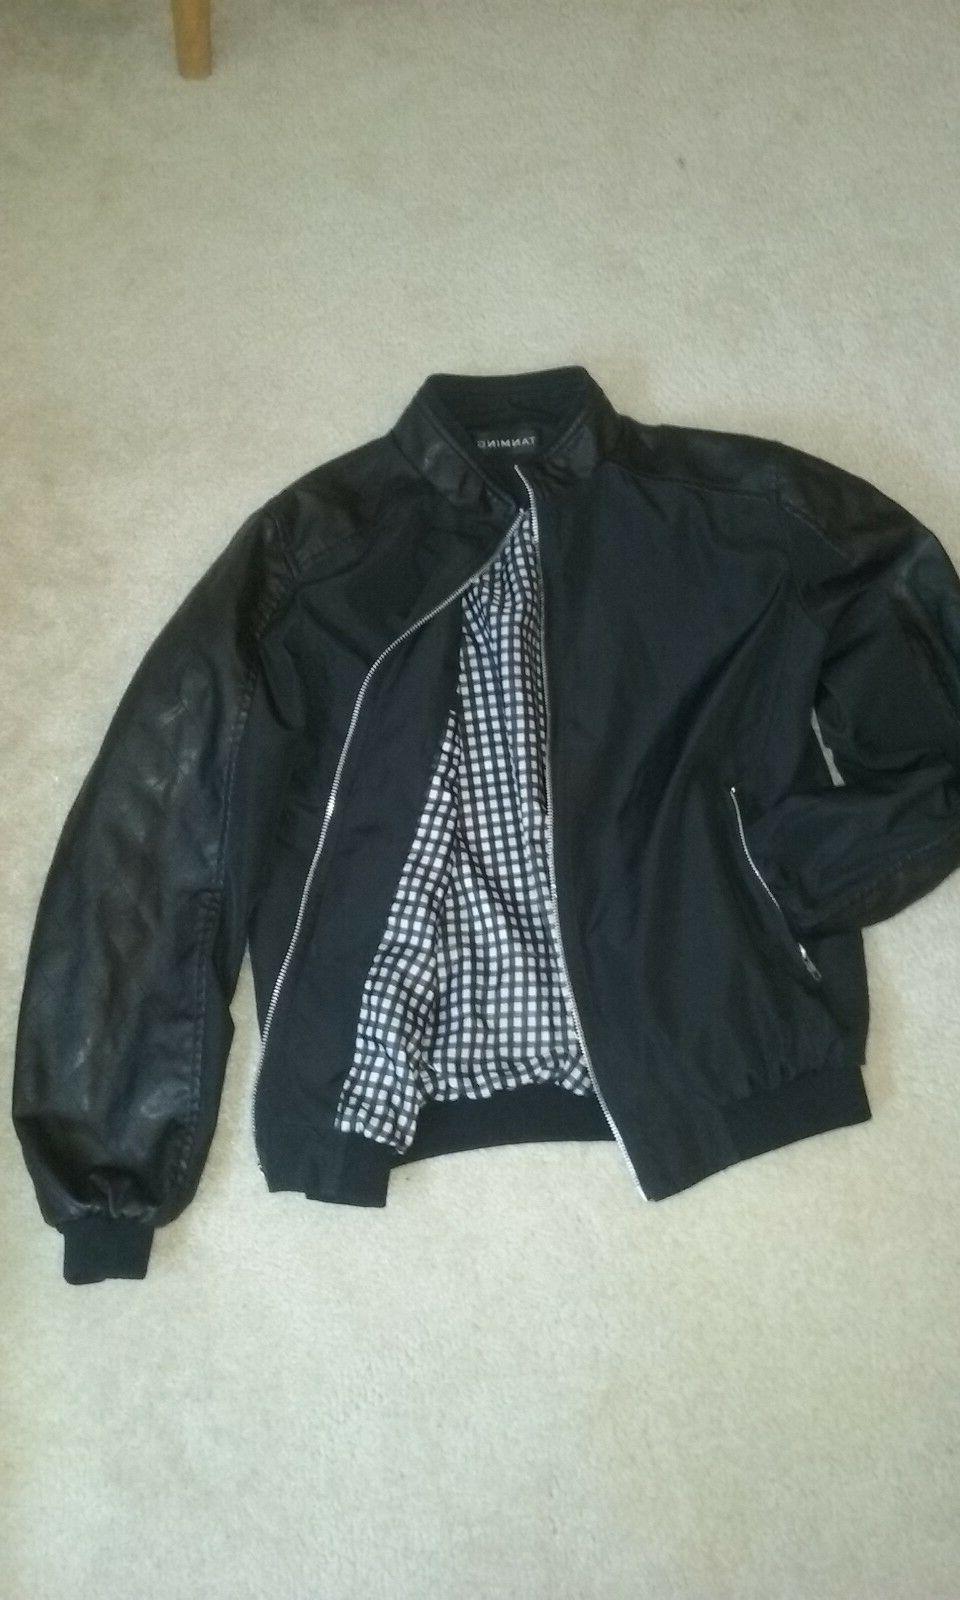 Men's Faux Leather Tanming Jacket, Men's XS size fall/winter